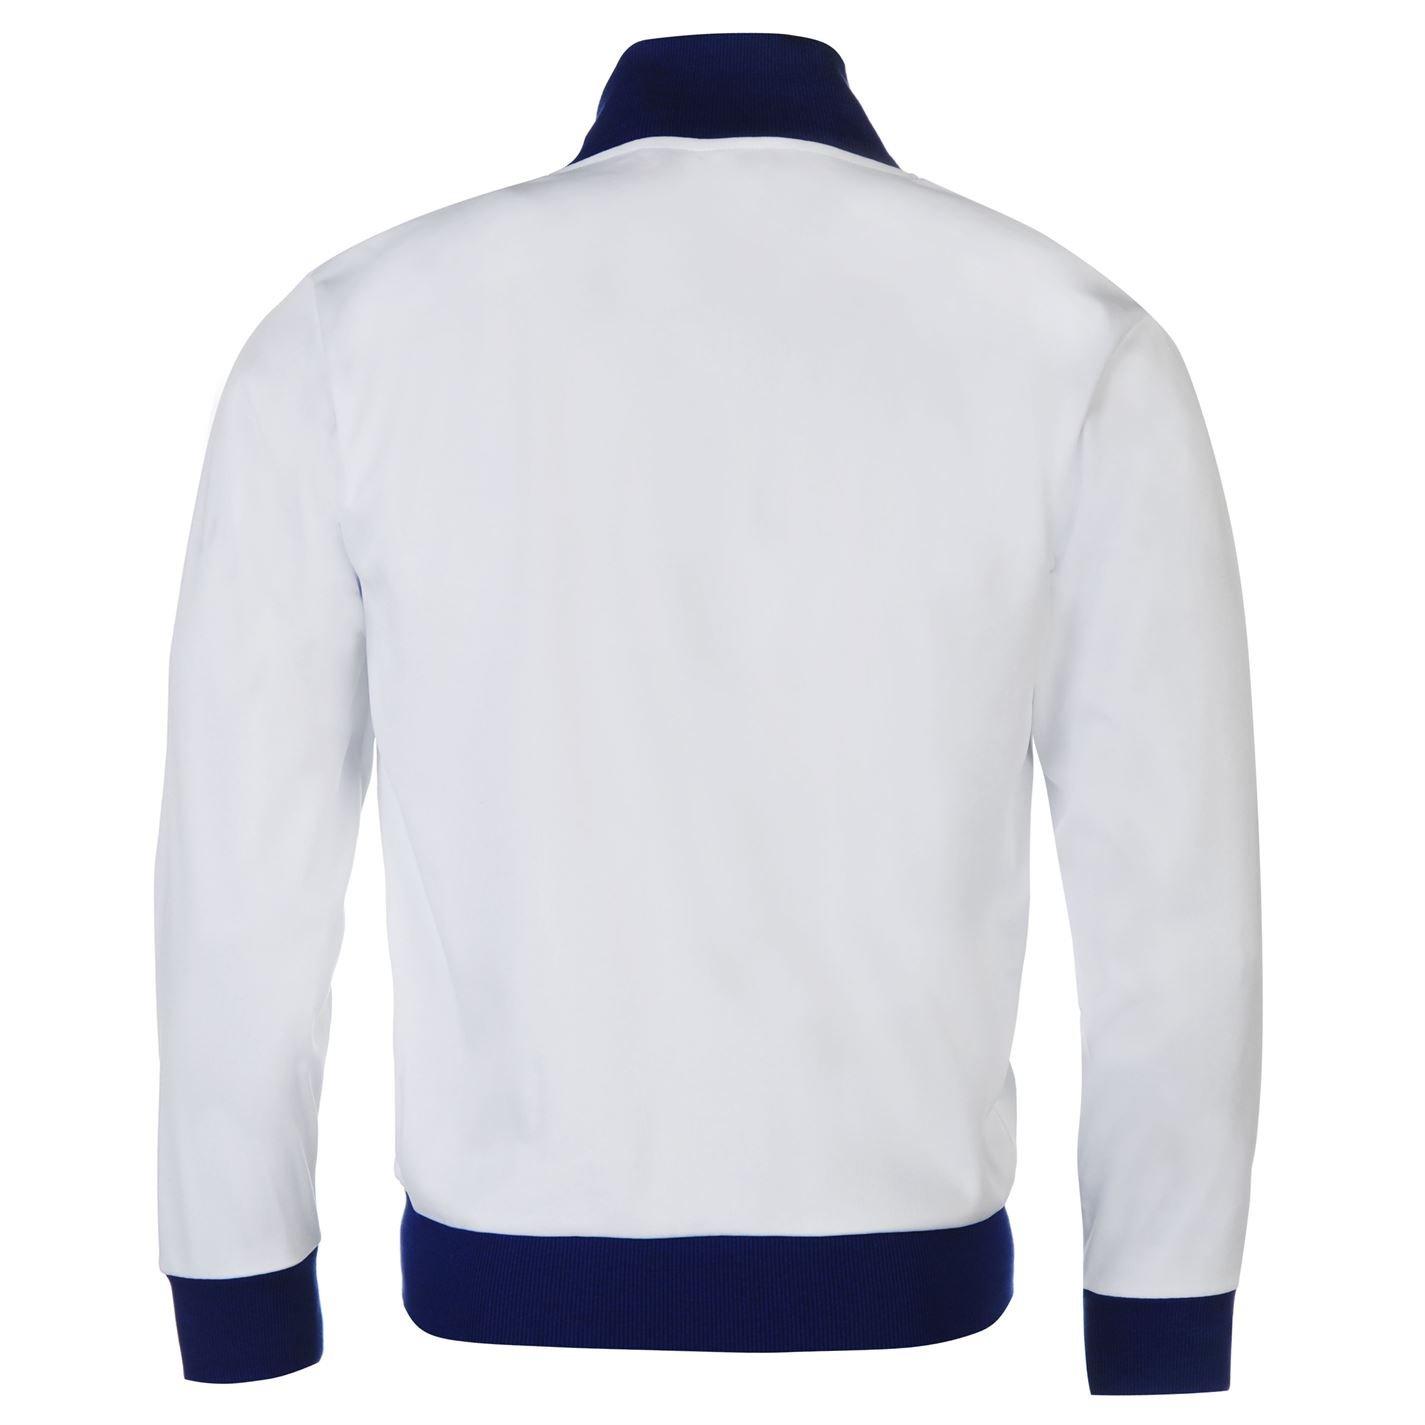 Score Draw Hombre Retro Leeds United 1972 Home Chandal Top ...